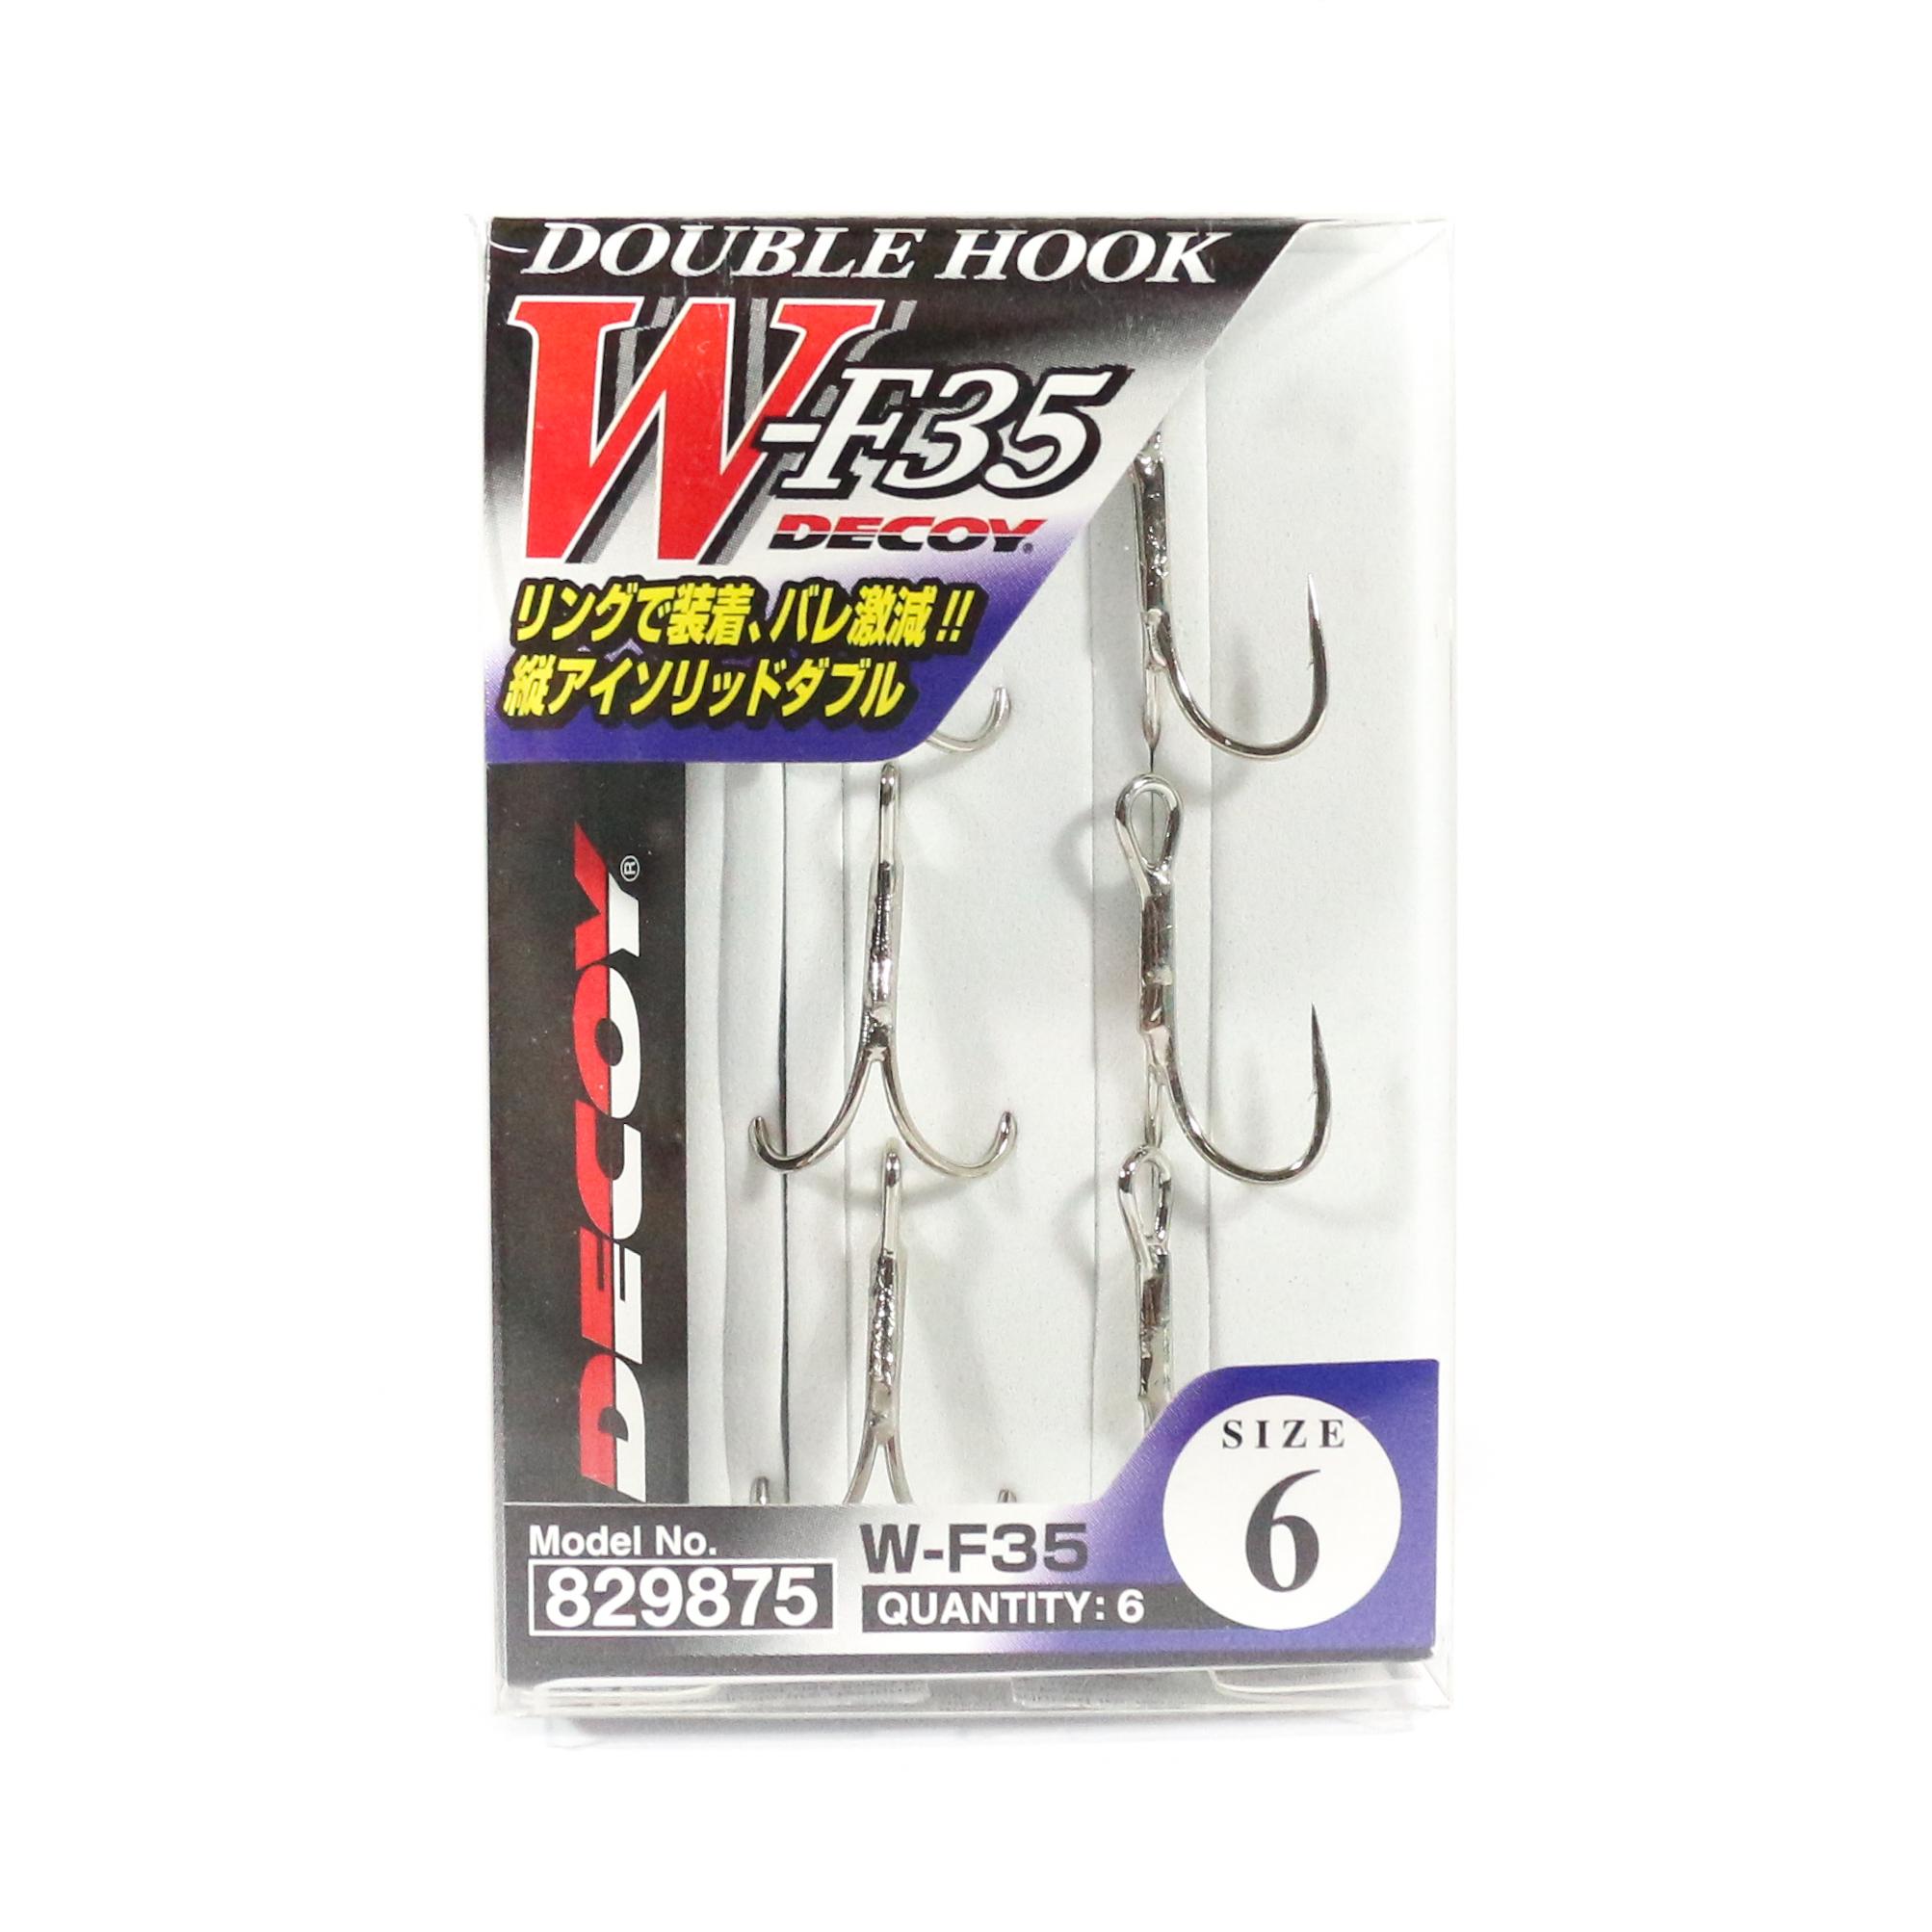 Decoy W-F35 Double Hooks Snagless Size 6 (9875)